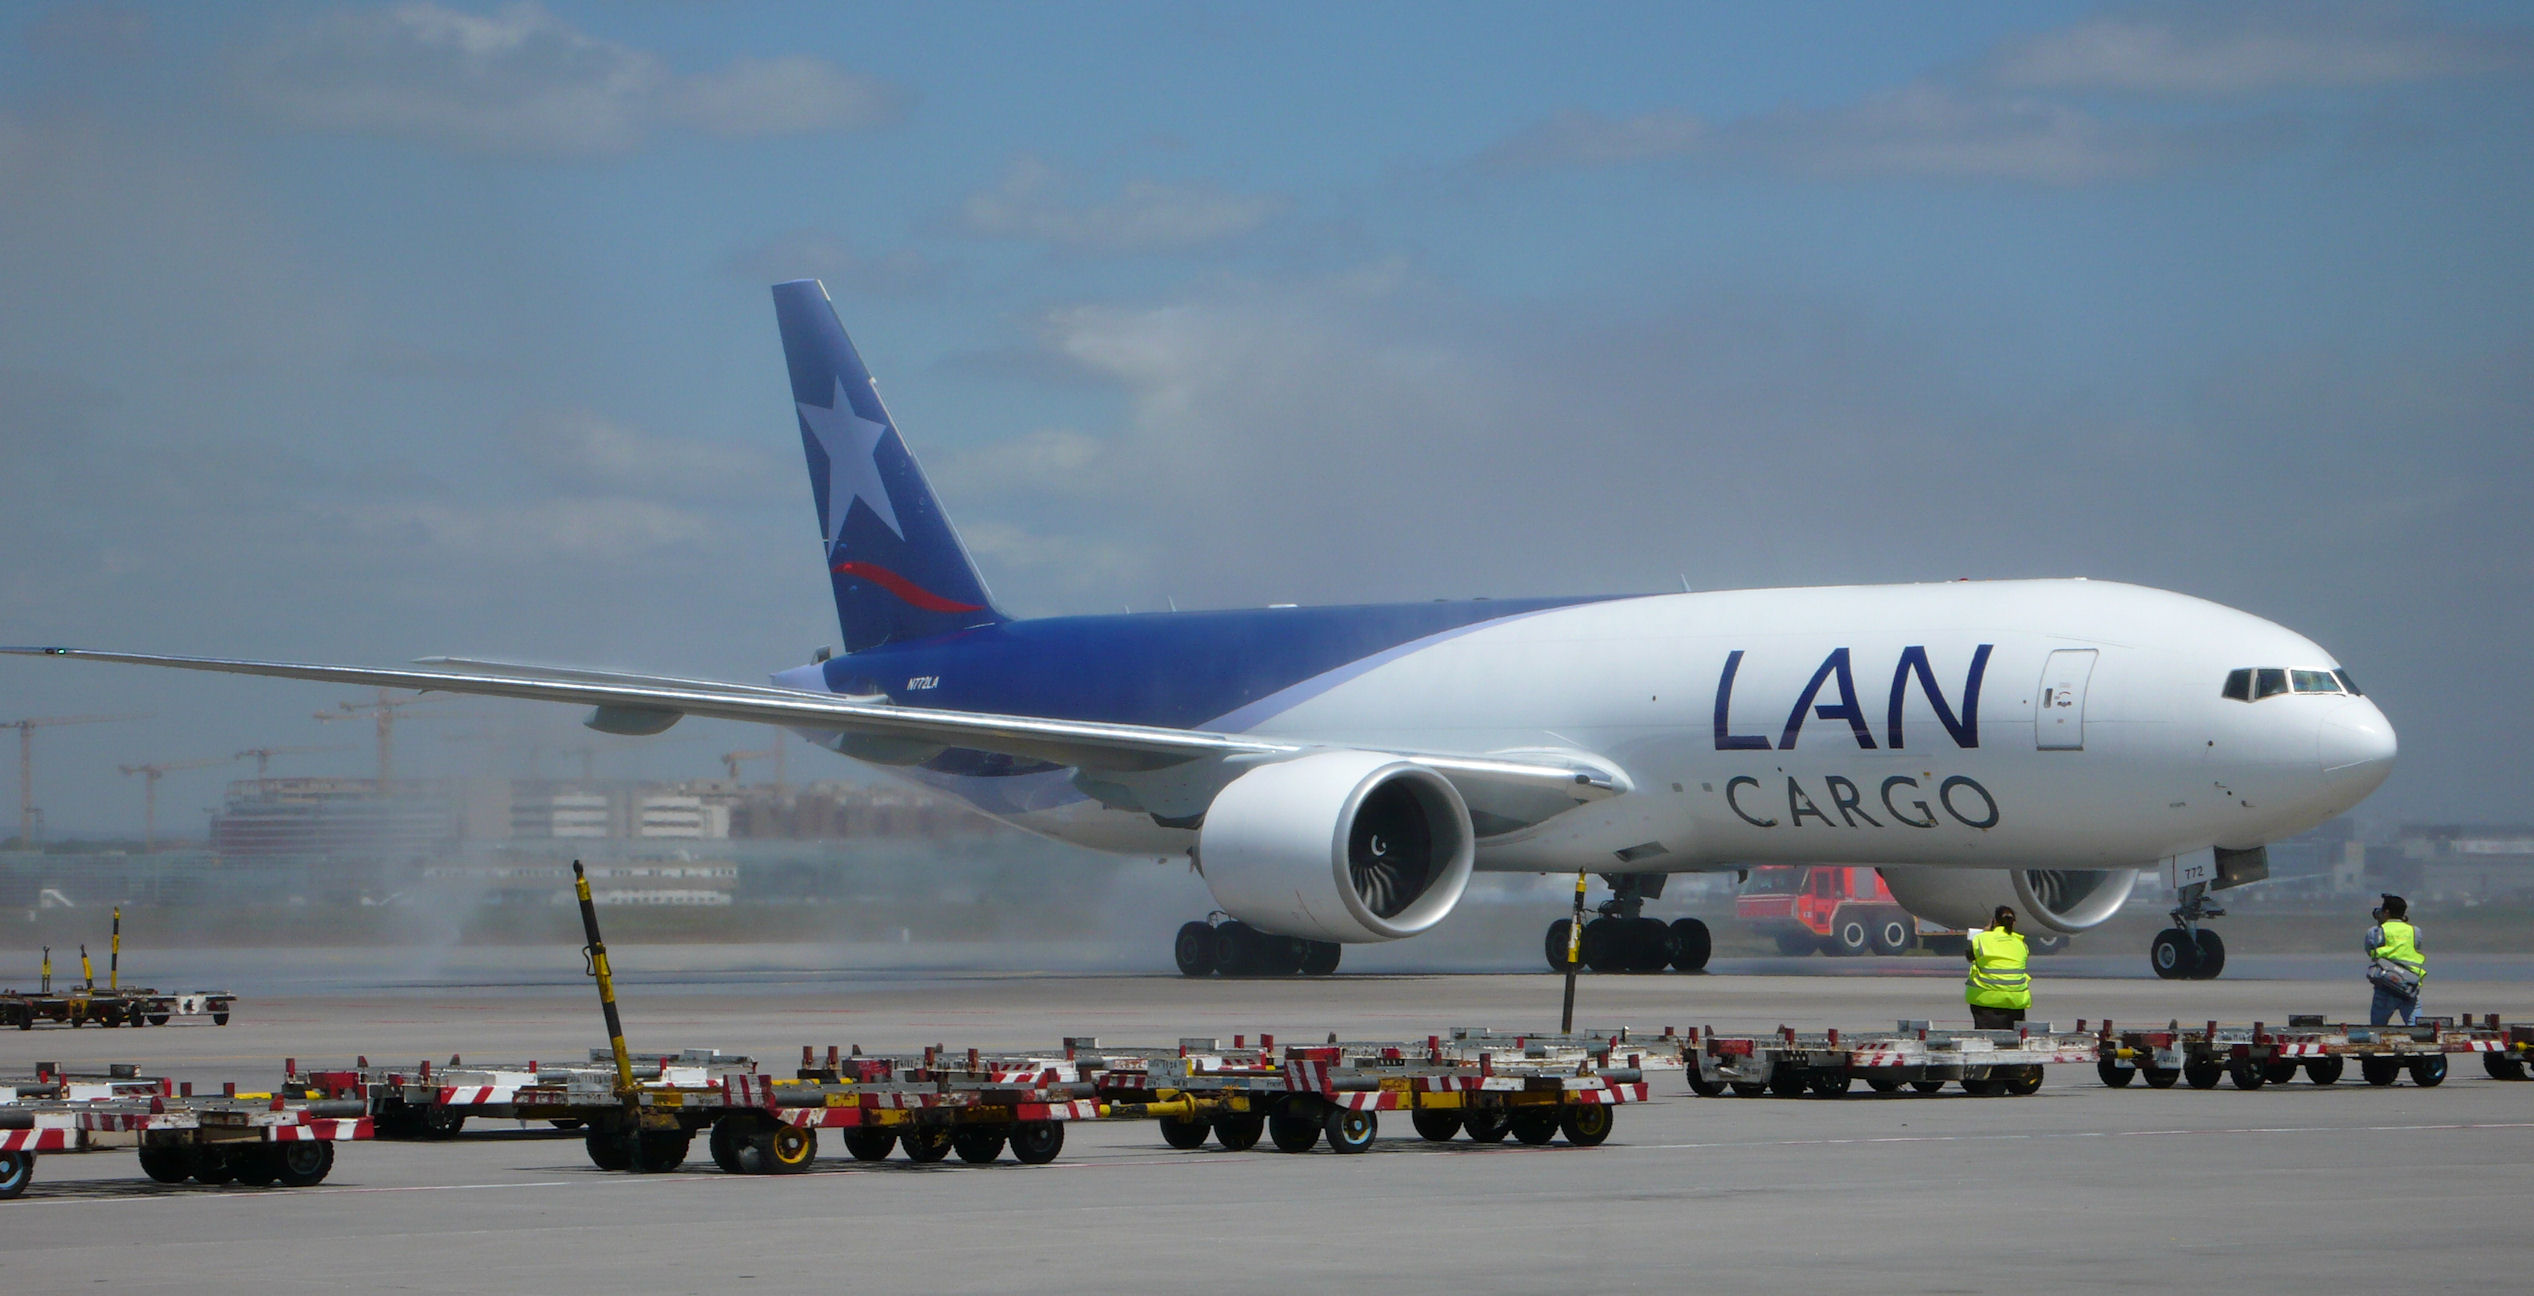 Atlas buys B777 freighter pair from LATAM ǀ Air Cargo News